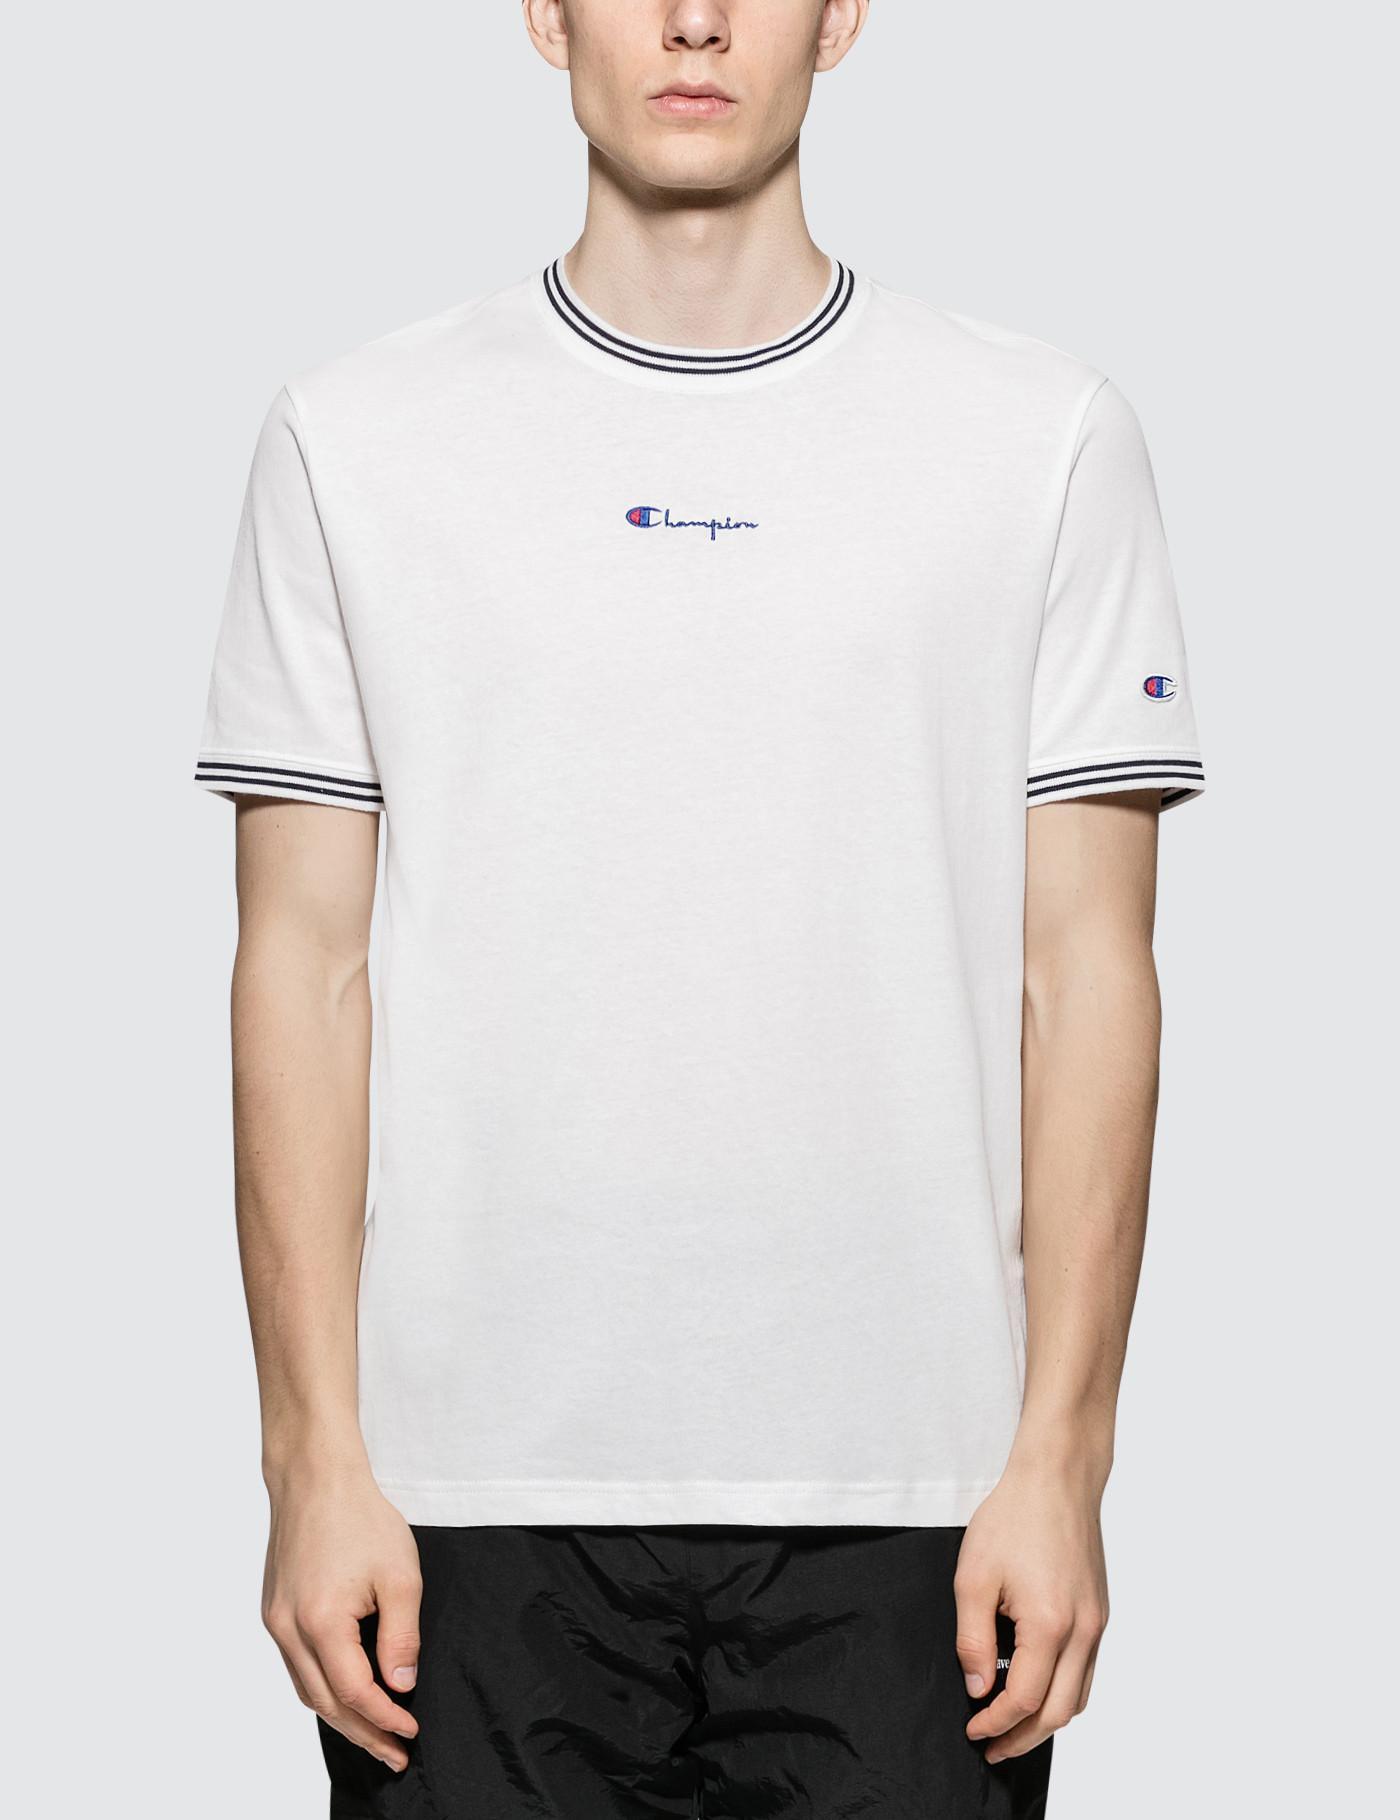 1fc509acceccf6 Champion - Black Rib Neckline S s T-shirt for Men - Lyst. View fullscreen